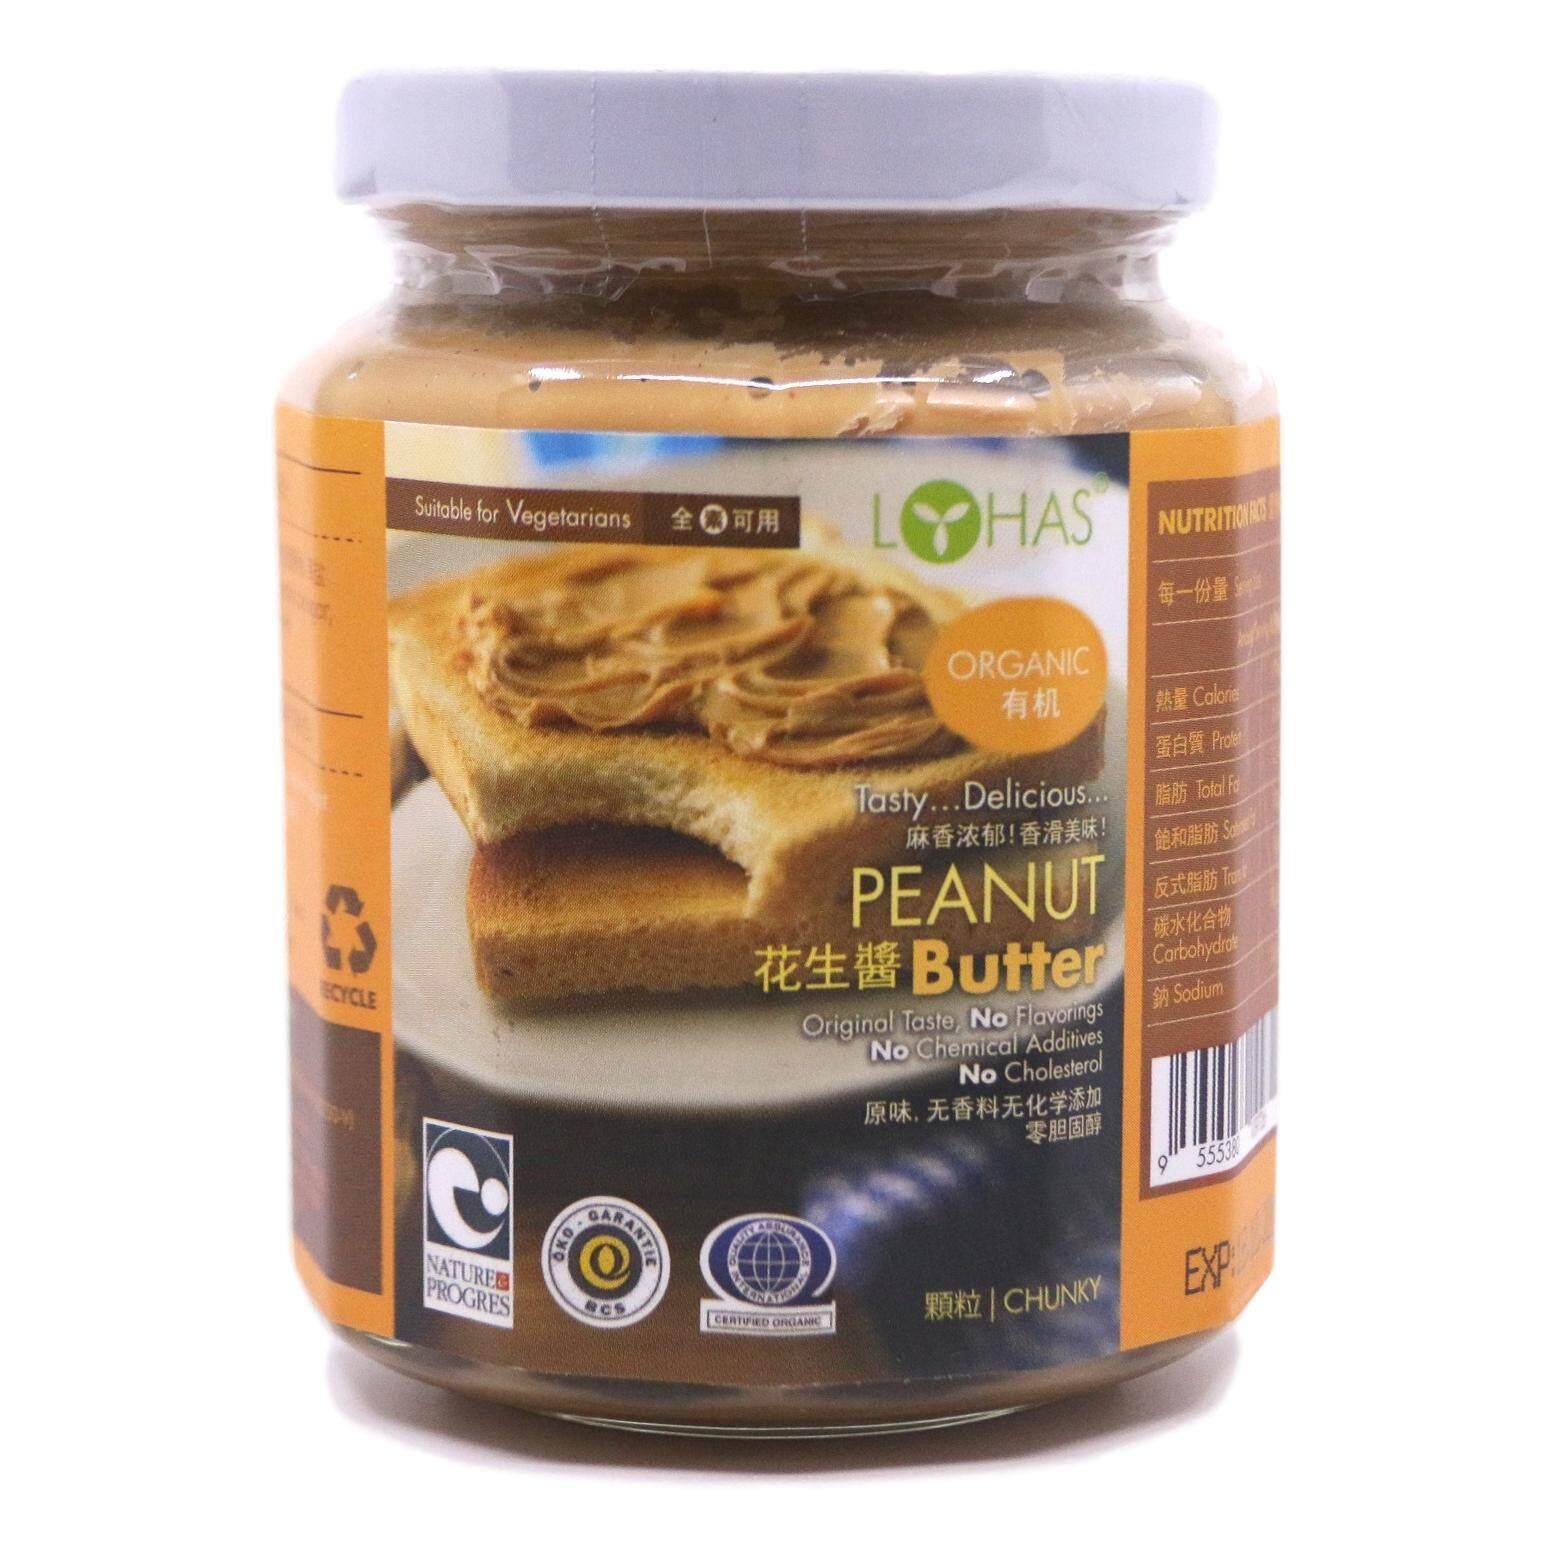 Lohas Organic Peanut Butter (300g) Chunky By Zens Organic.